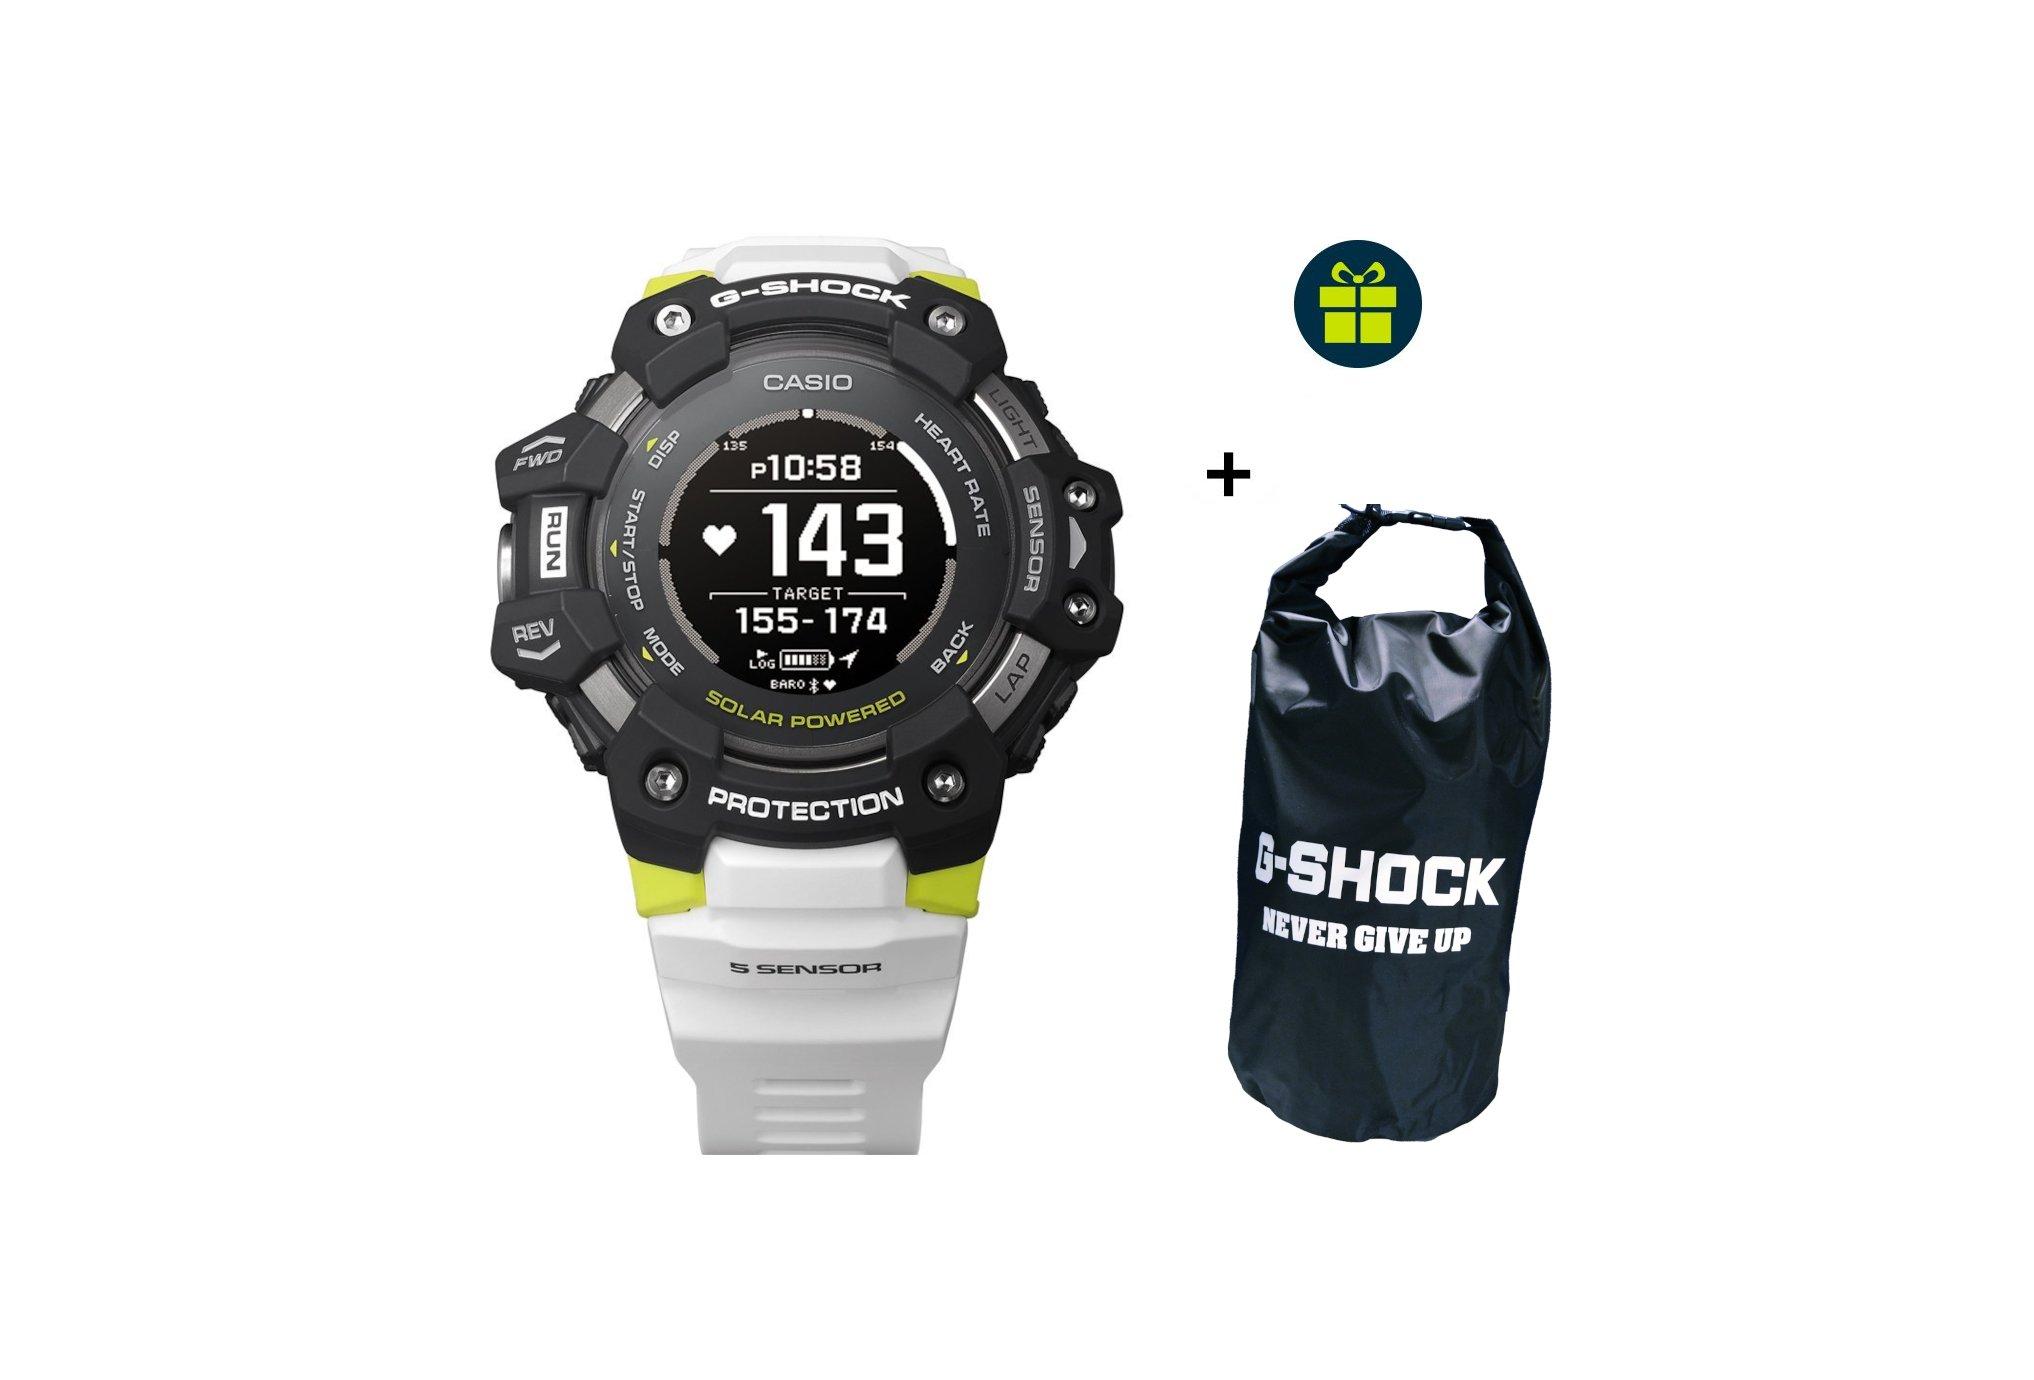 Casio G-SQUAD HR GBD-H1000-1A7ER et sac étanche G-Shock offert Cardio-Gps